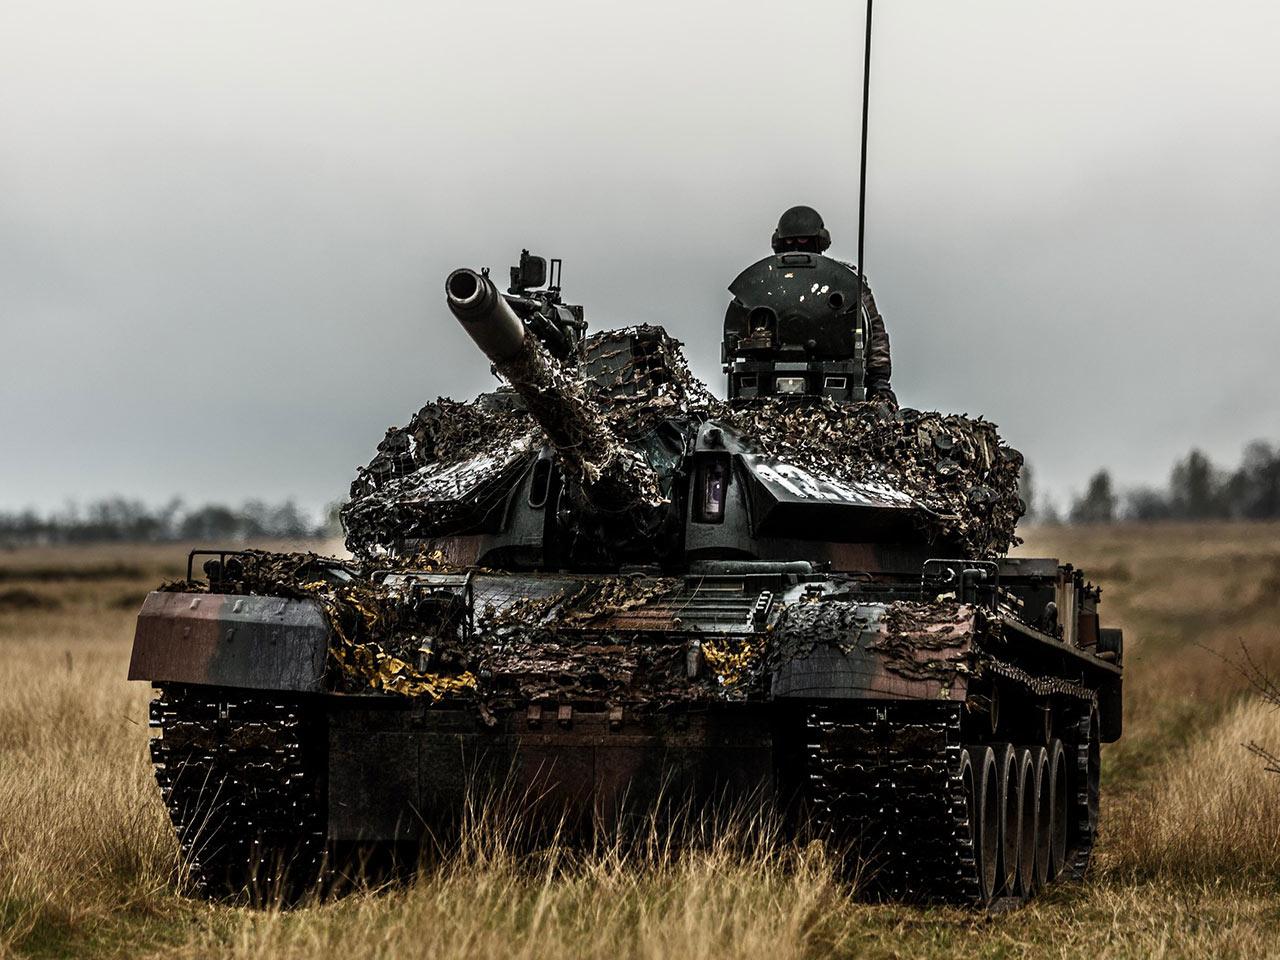 Romanian TR-85 MBT